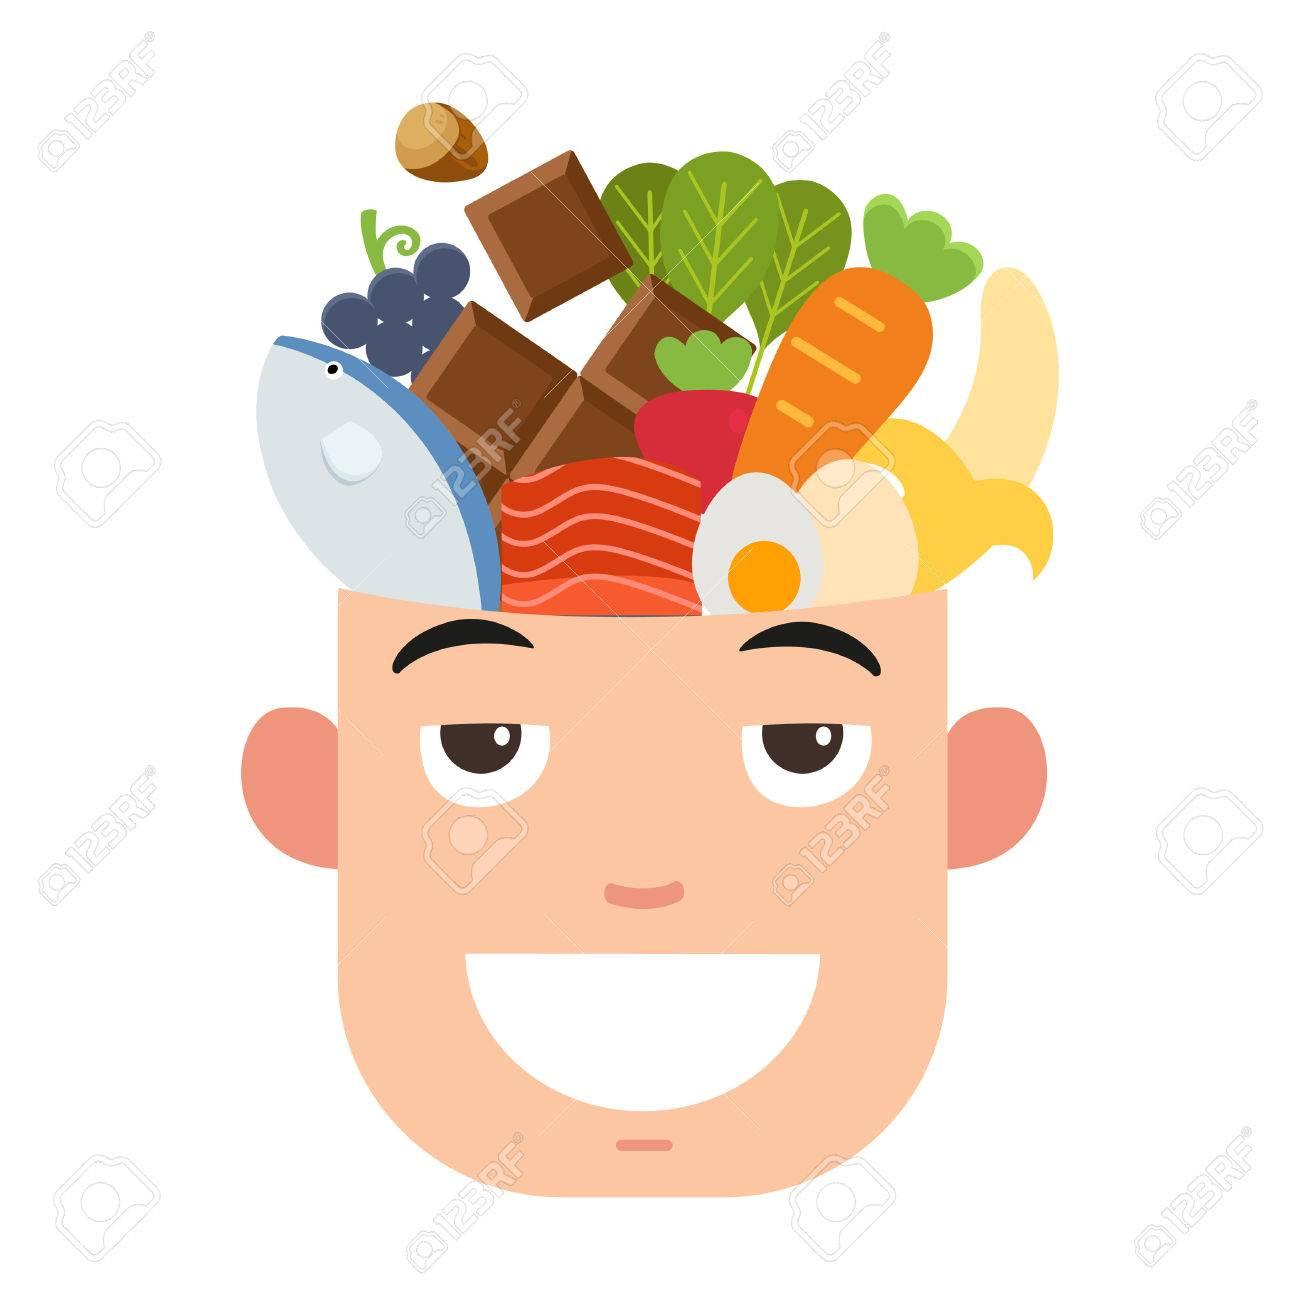 Brain power food,vector illustration - 47114708